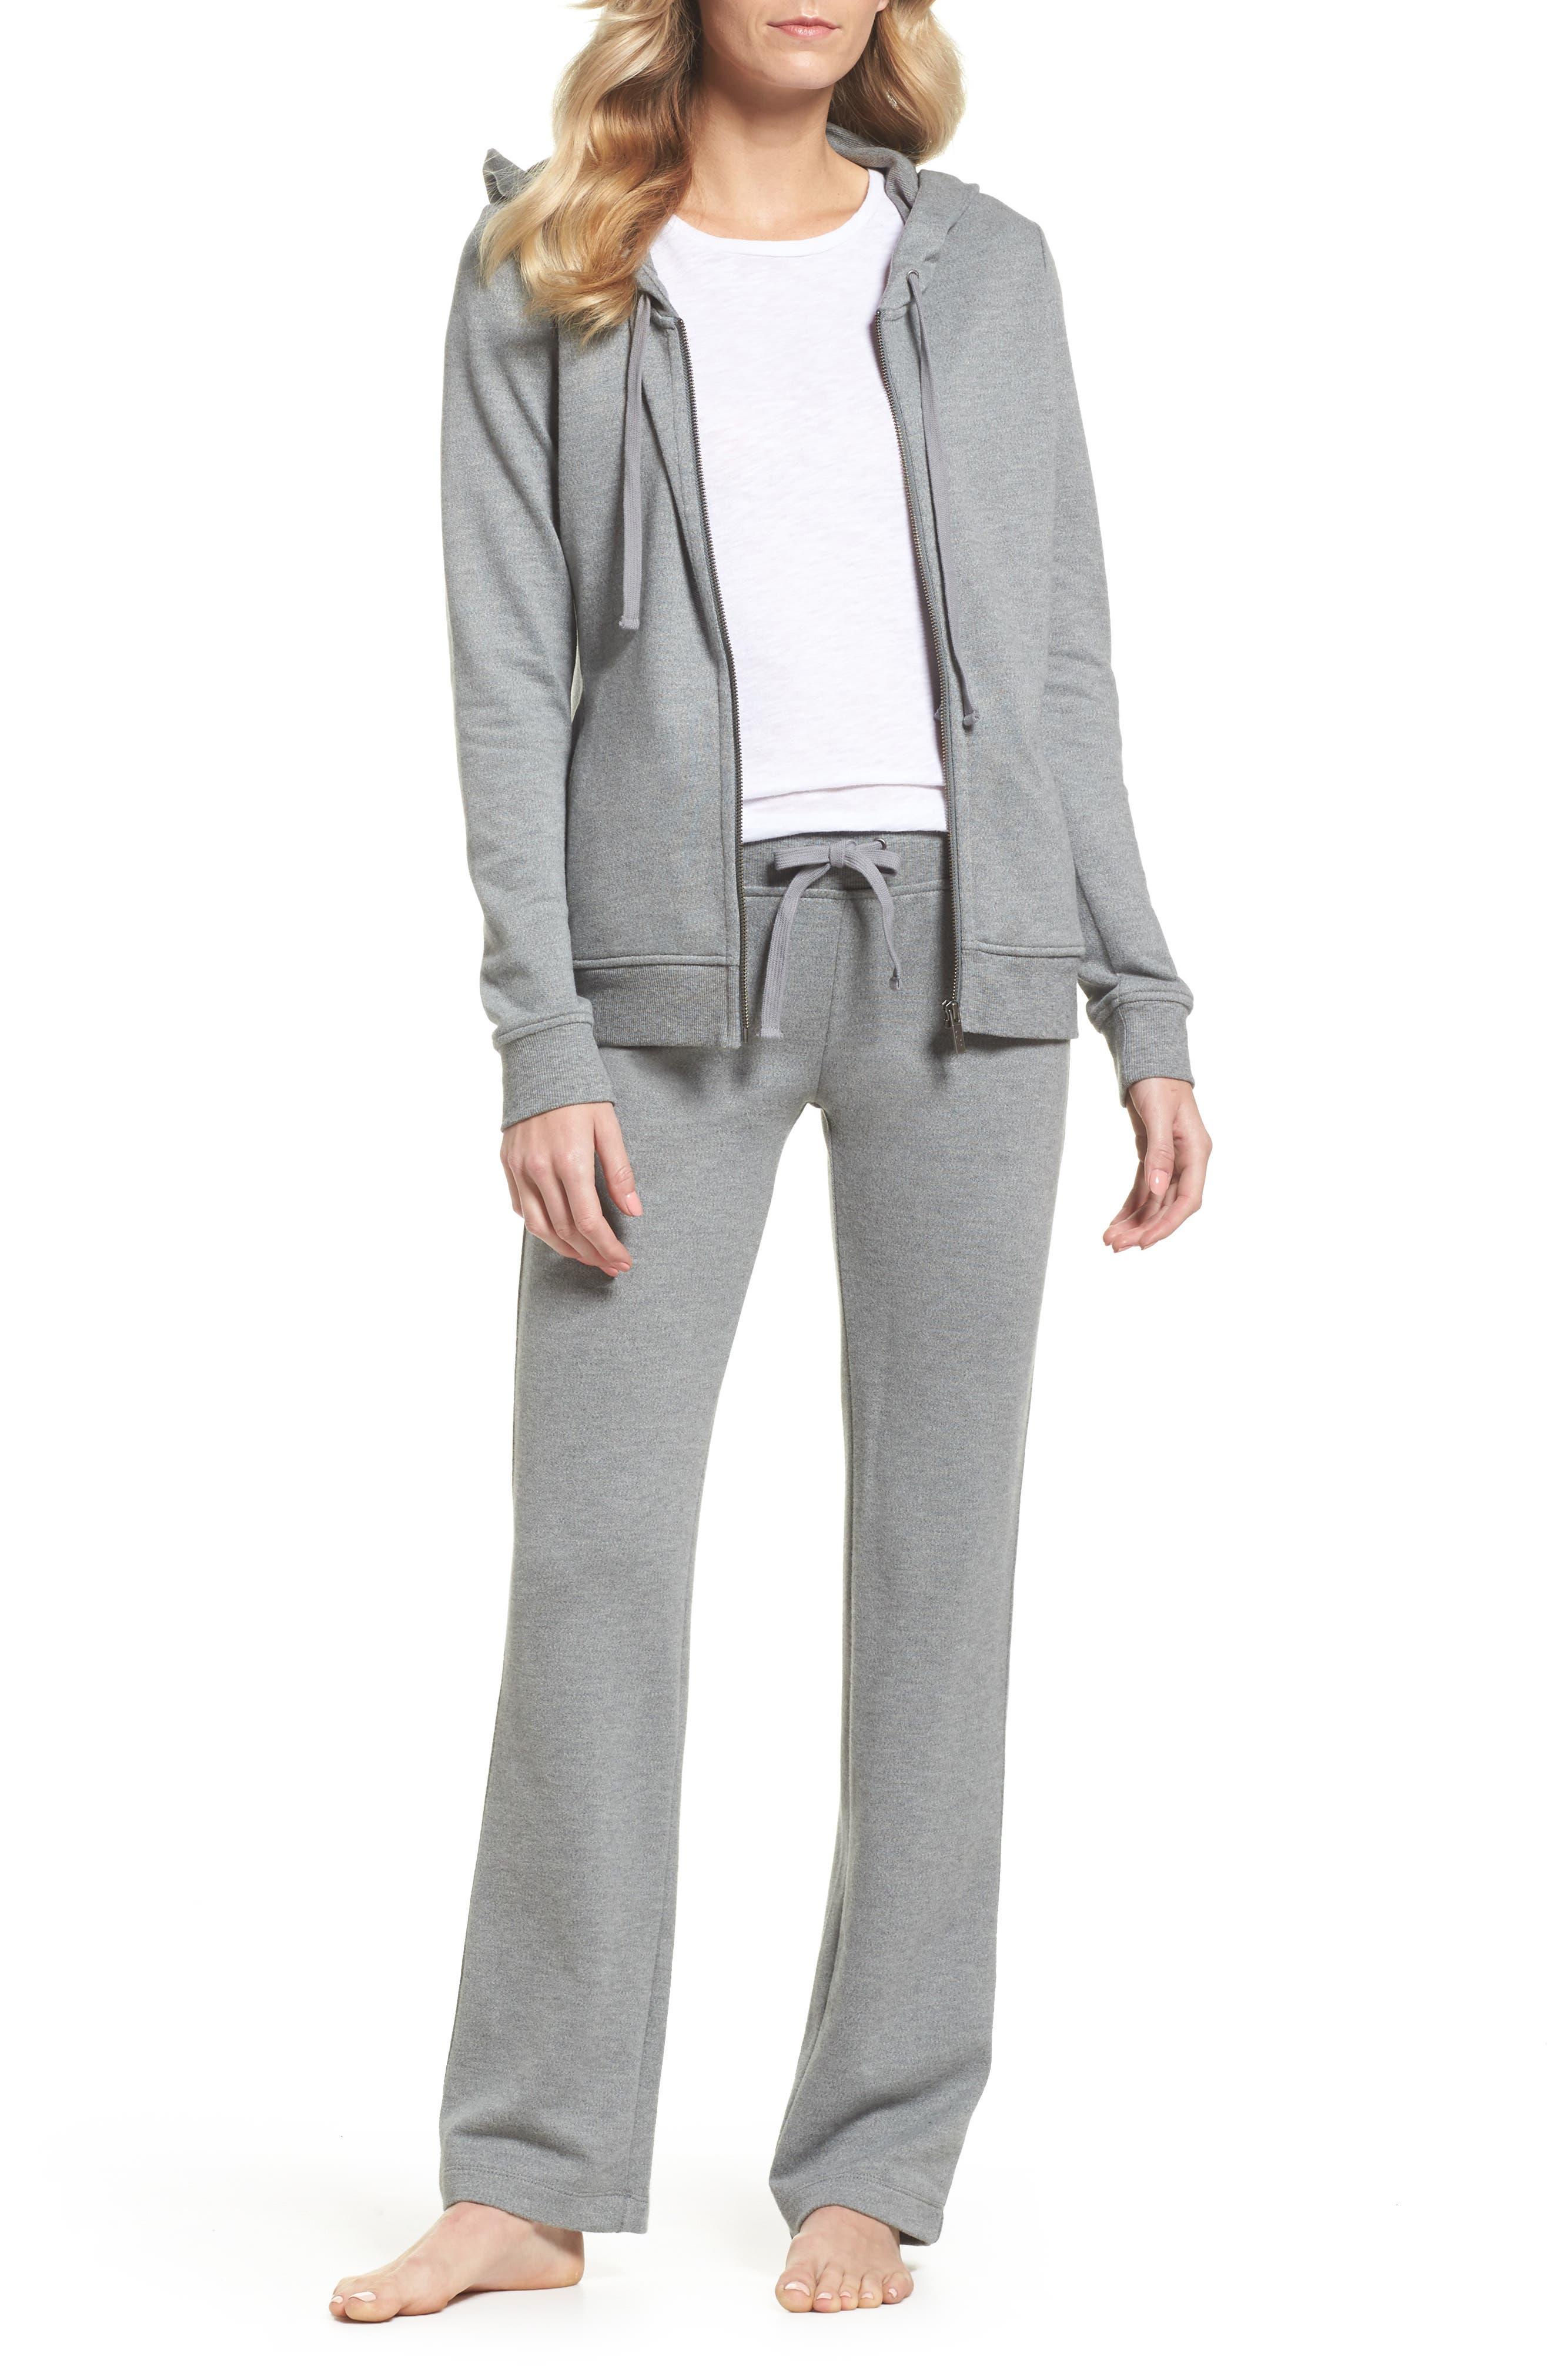 Penny Lounge Pants,                             Alternate thumbnail 5, color,                             Grey Heather